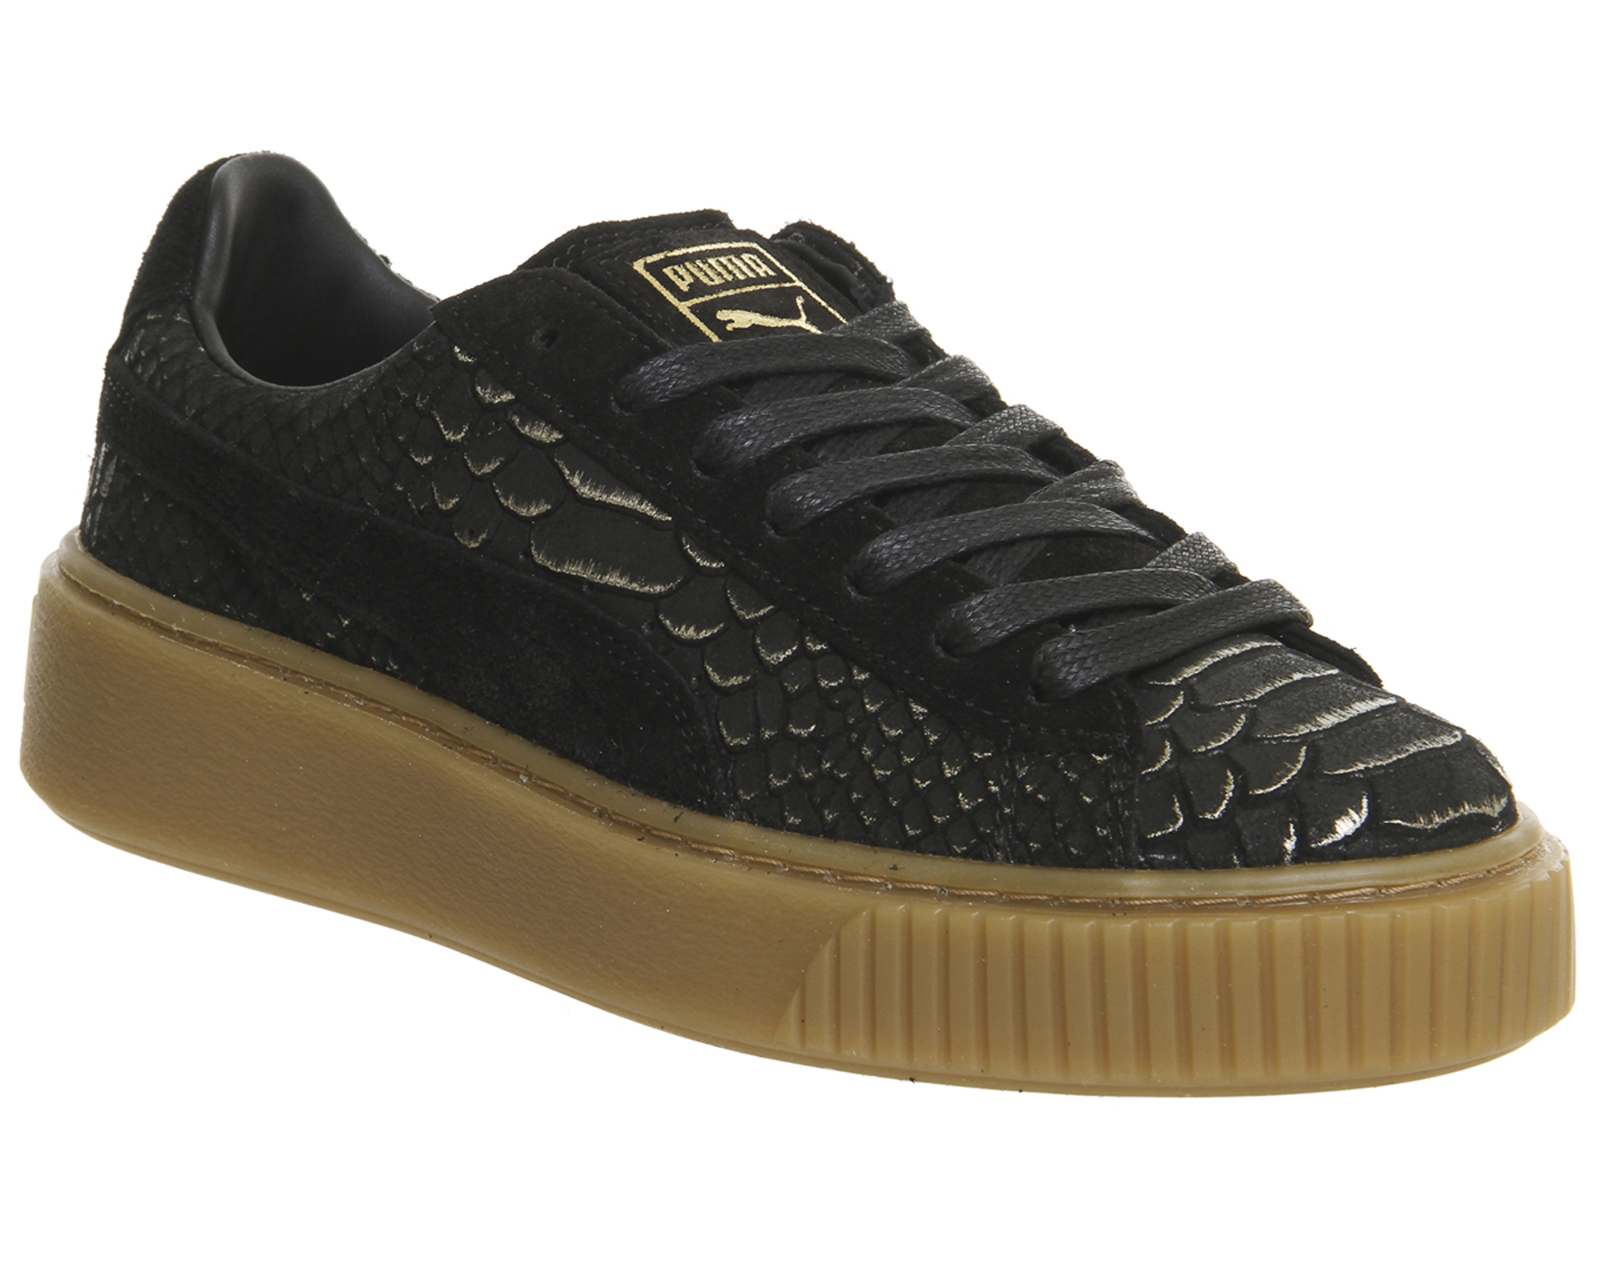 fac2ca06523 ... Womens-Puma-Suede-Platform-BLACK-GOLD-EXOTICS-Trainers- ...